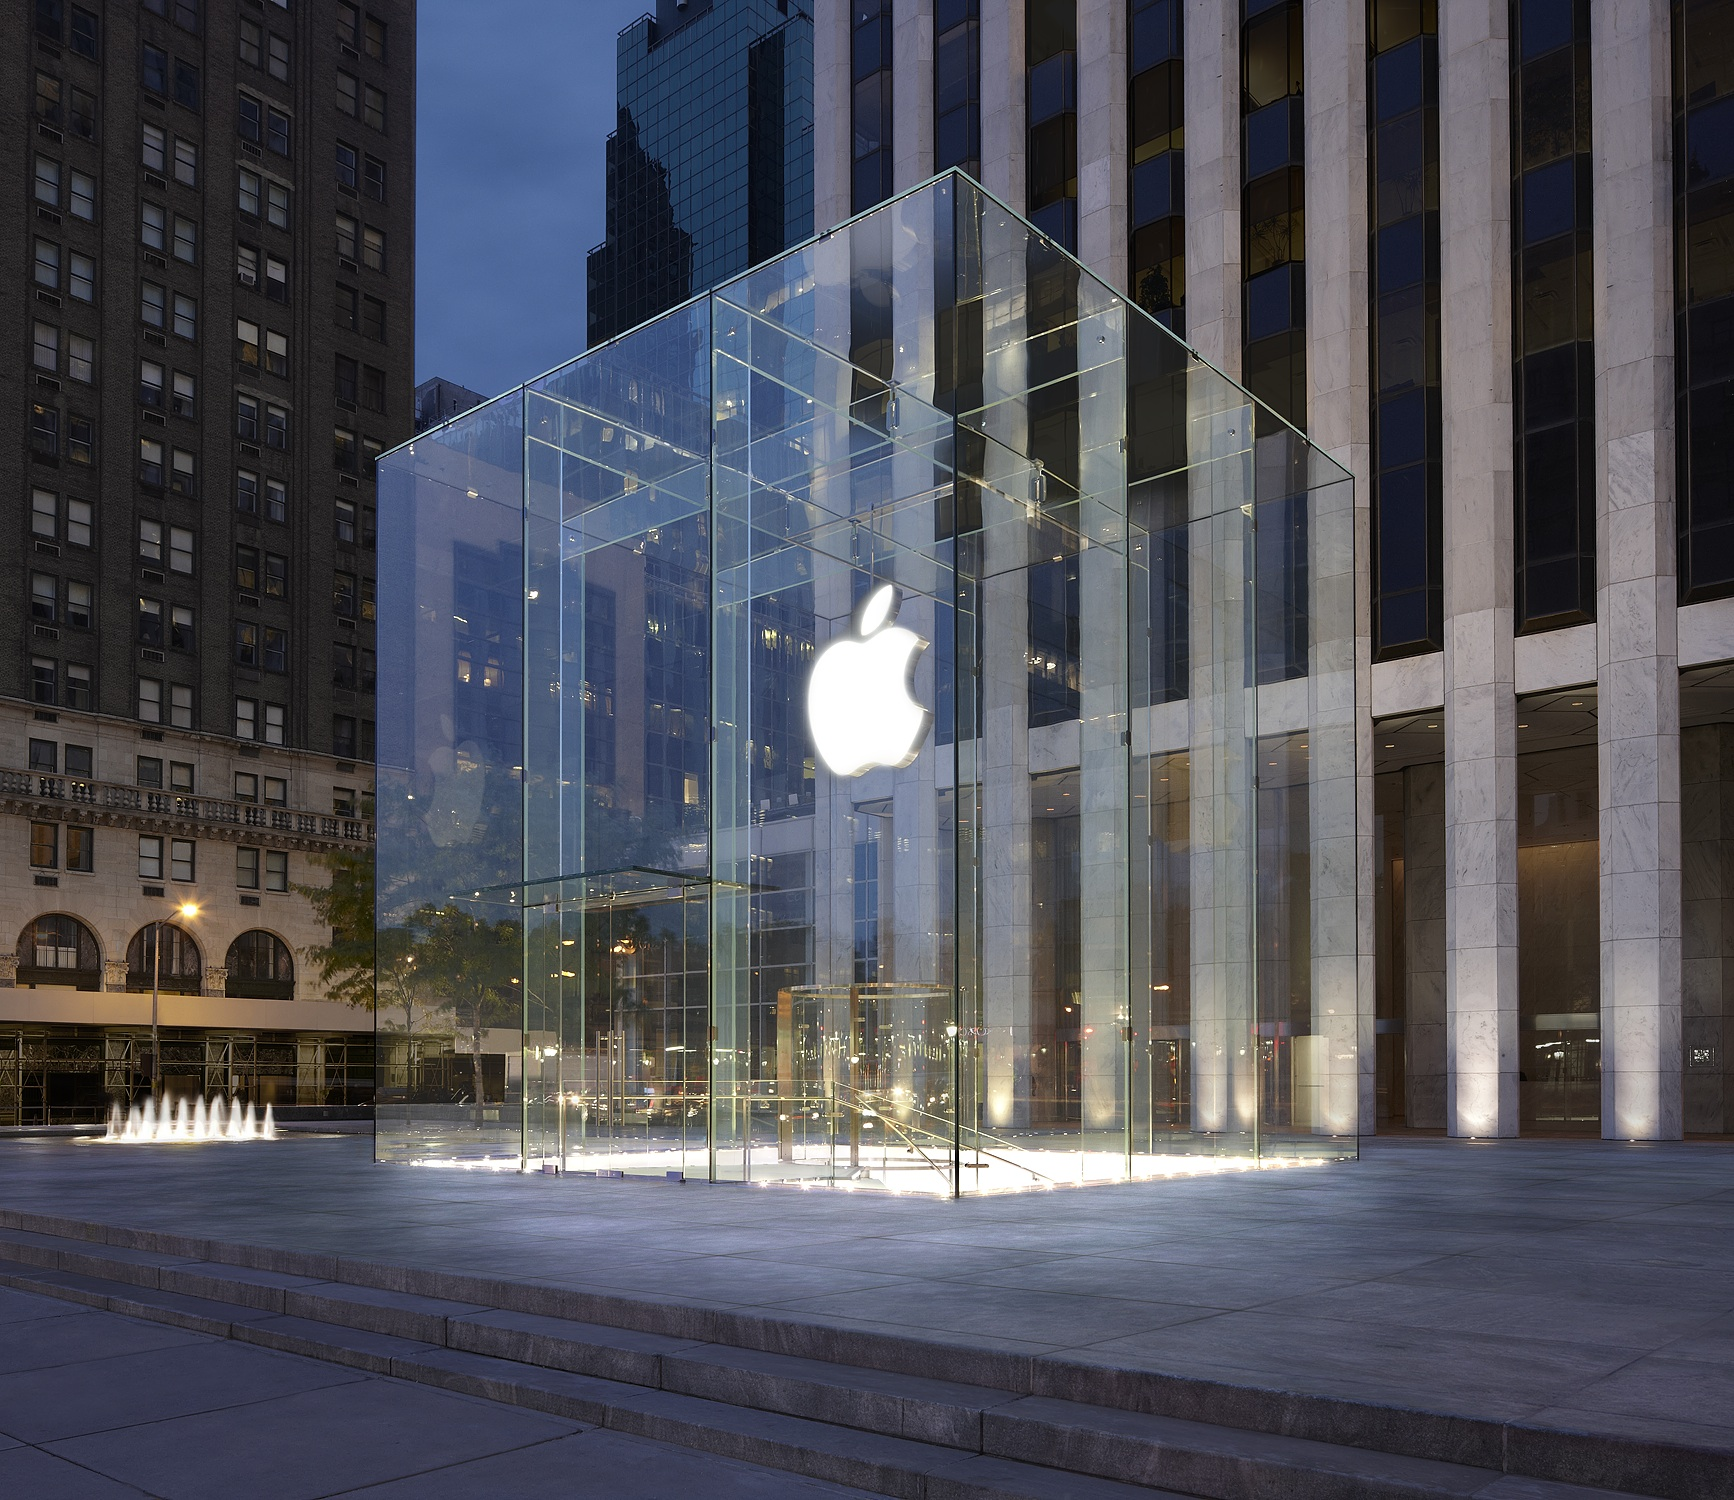 apple head office london. Apple Has Hired BBC Films Veteran Joe Oppenheimer As A Creative Executive For Its International Team \u2013 Led By Former Channel 4 Boss Jay Hunt. Head Office London